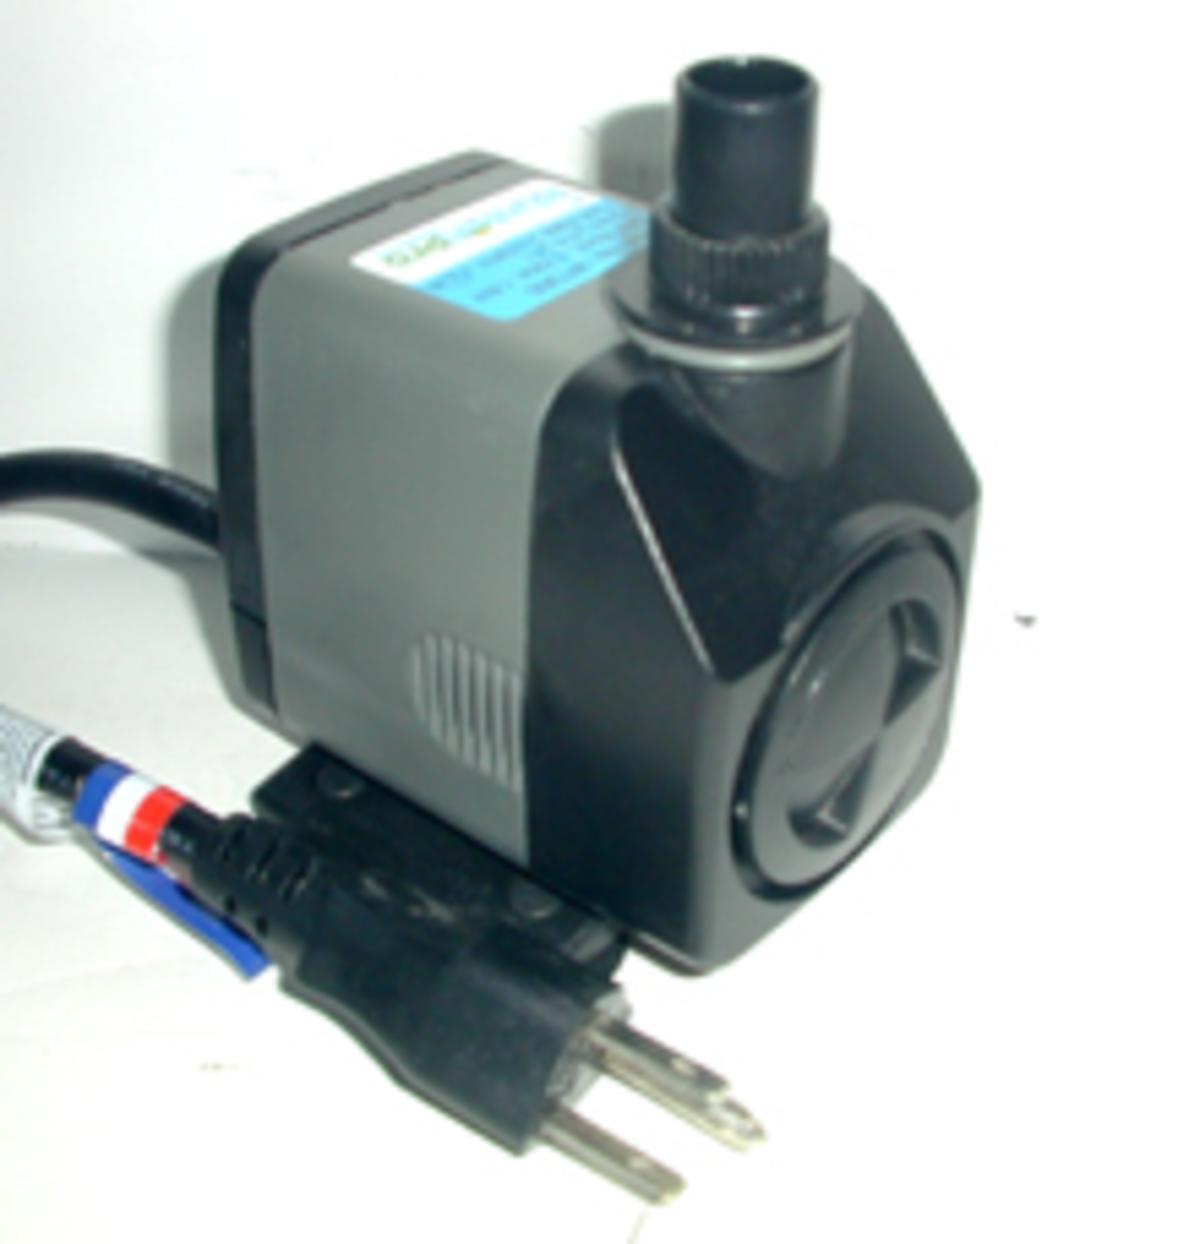 Fountain Pro's WT-300e Submersible pump